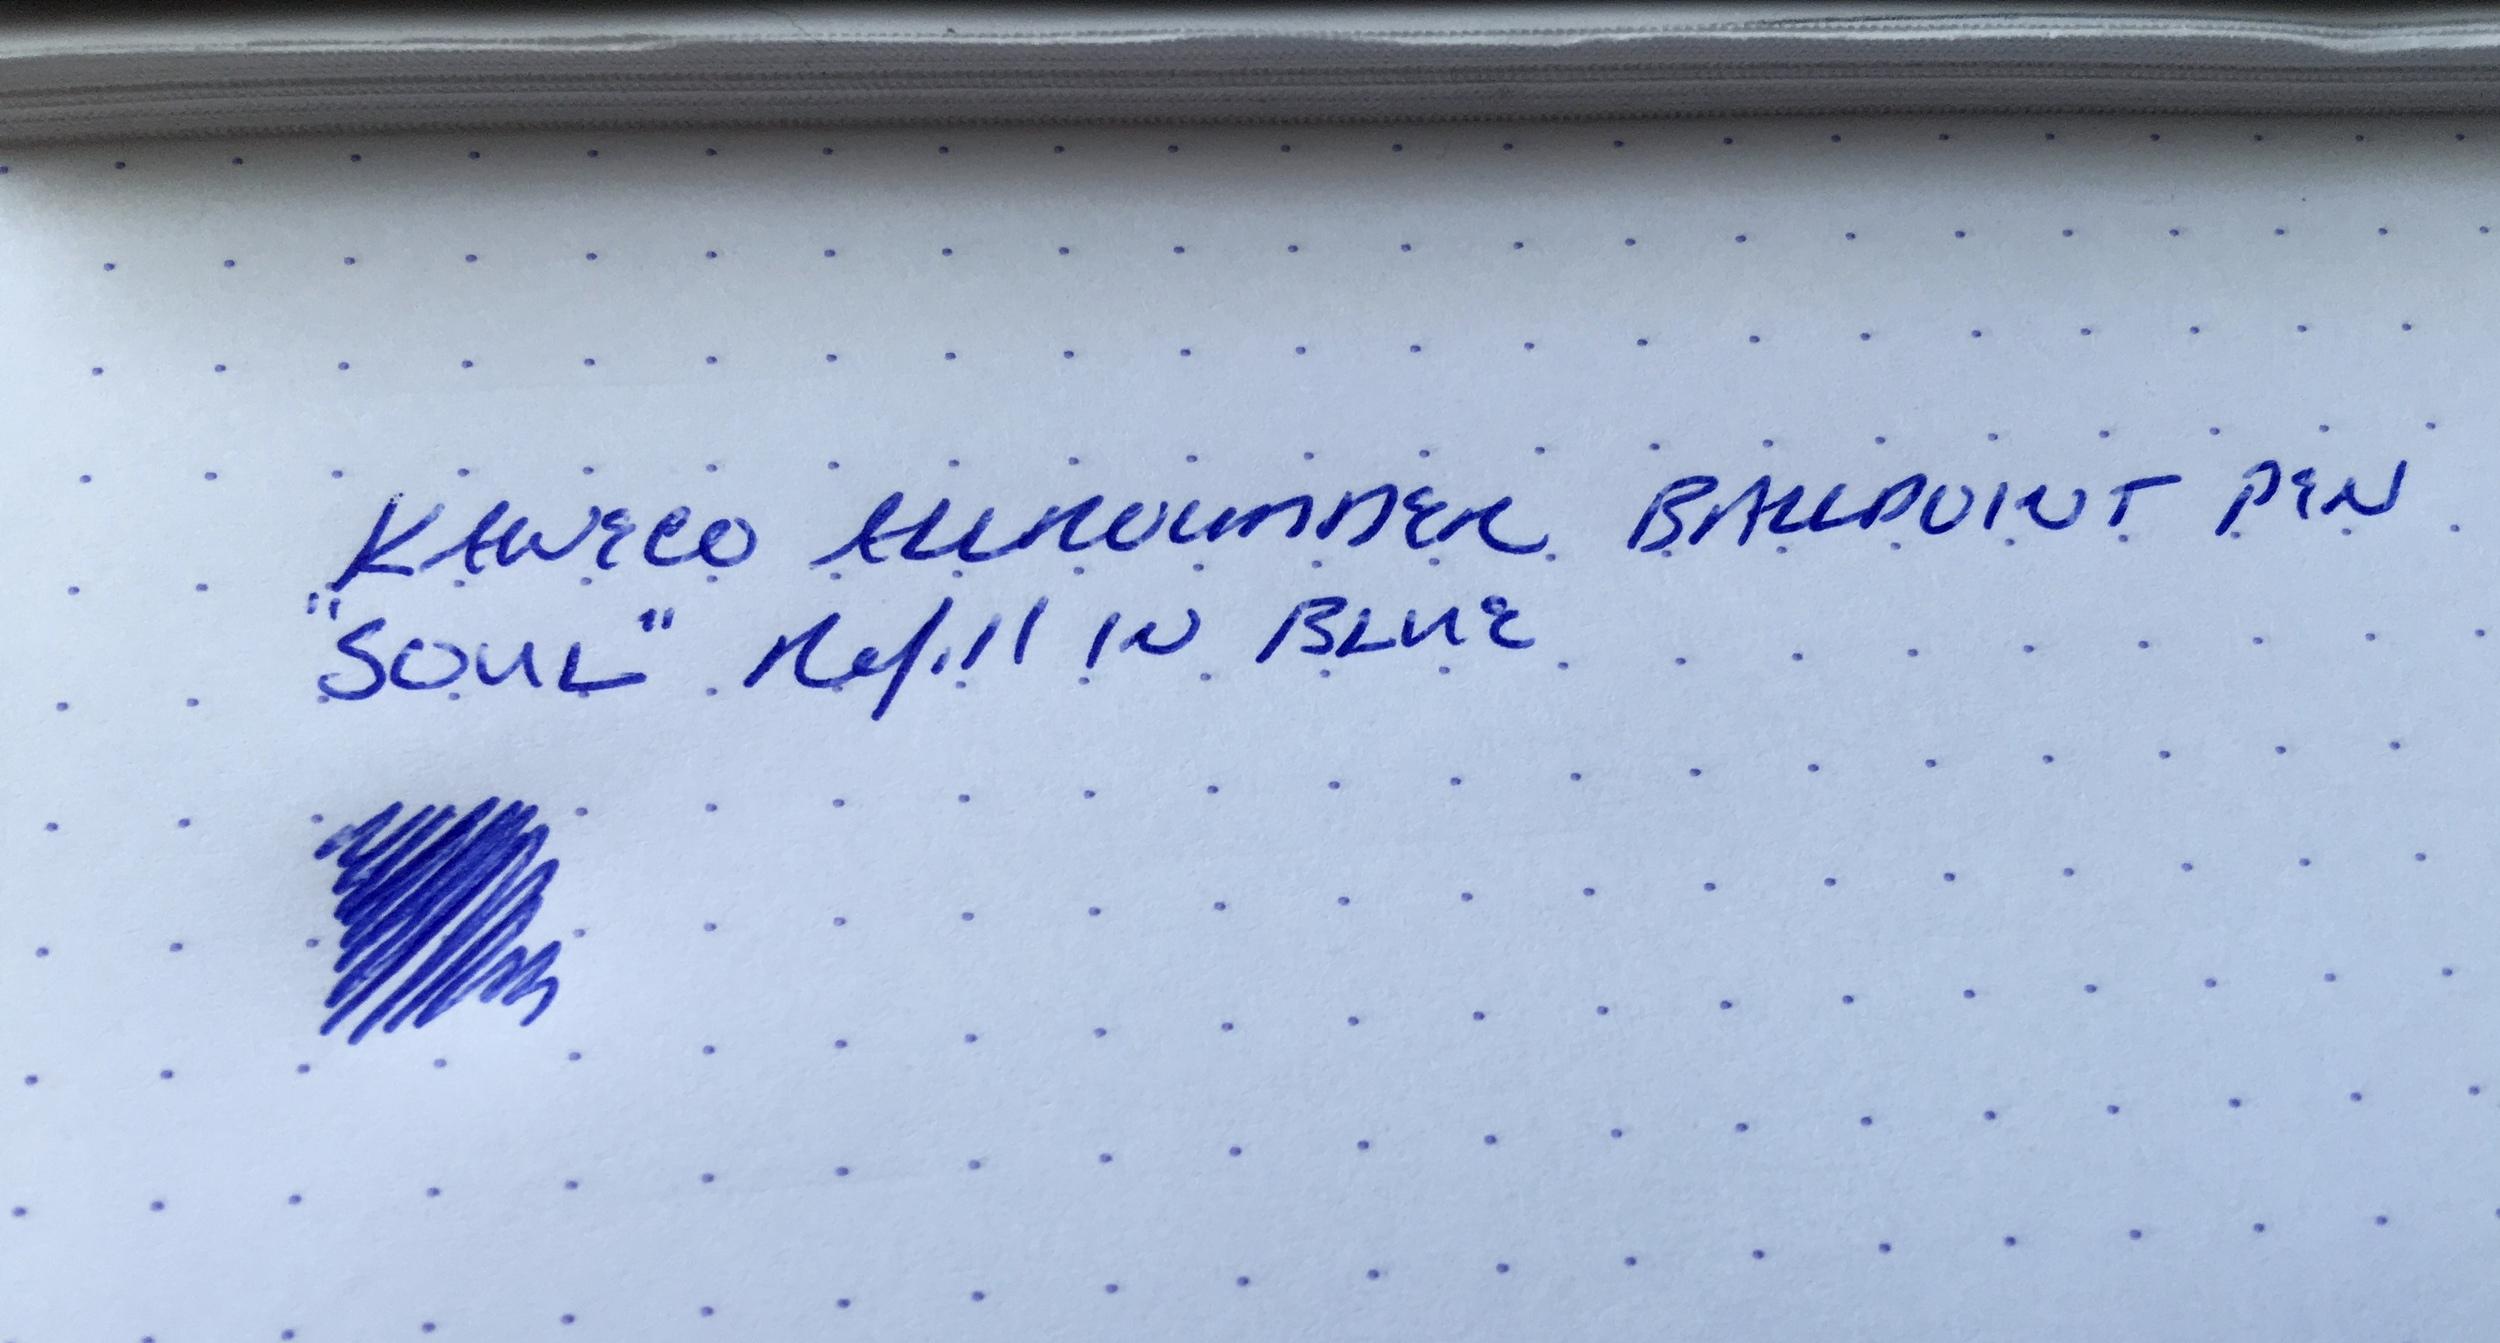 Kaweco Allrounder ballpoint writing sample